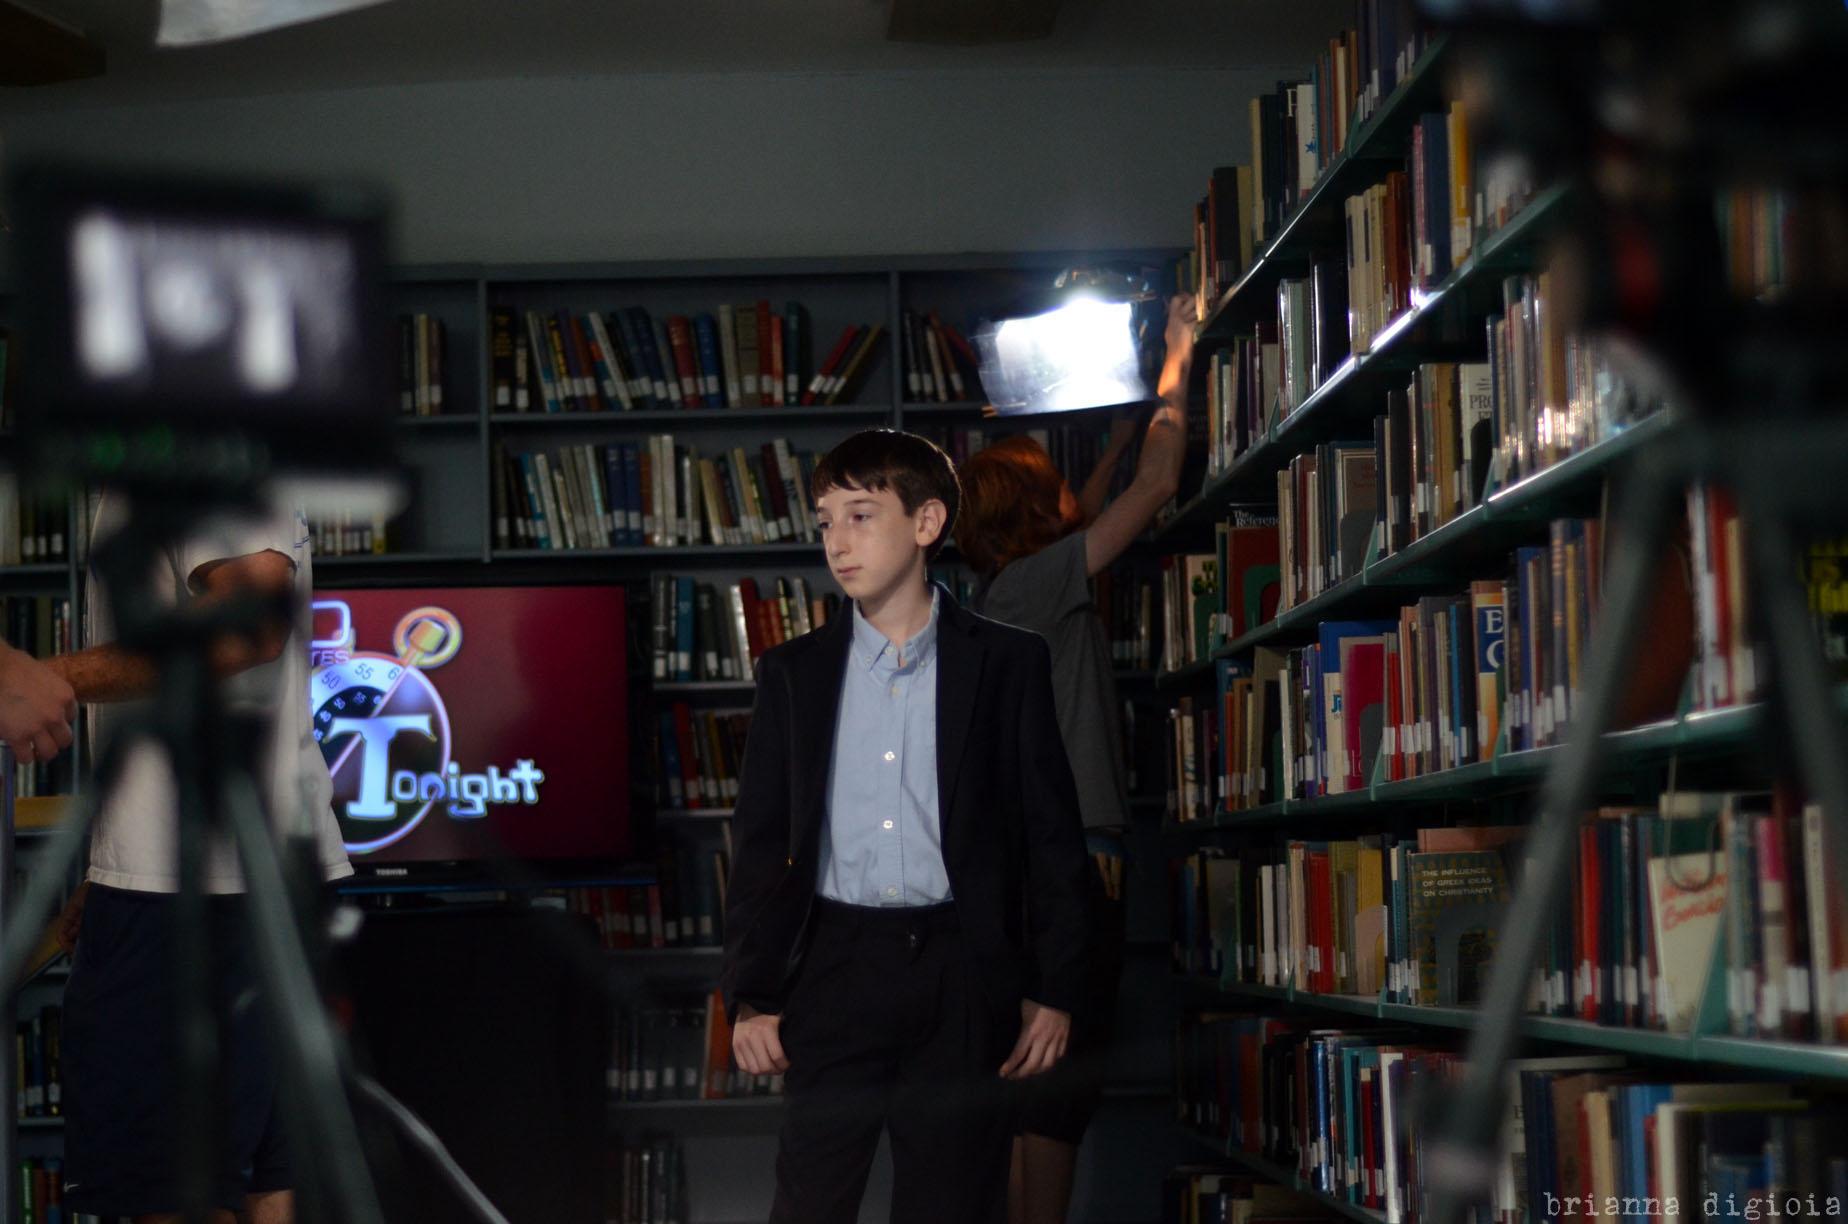 Joey Travolta's Short Film Camp